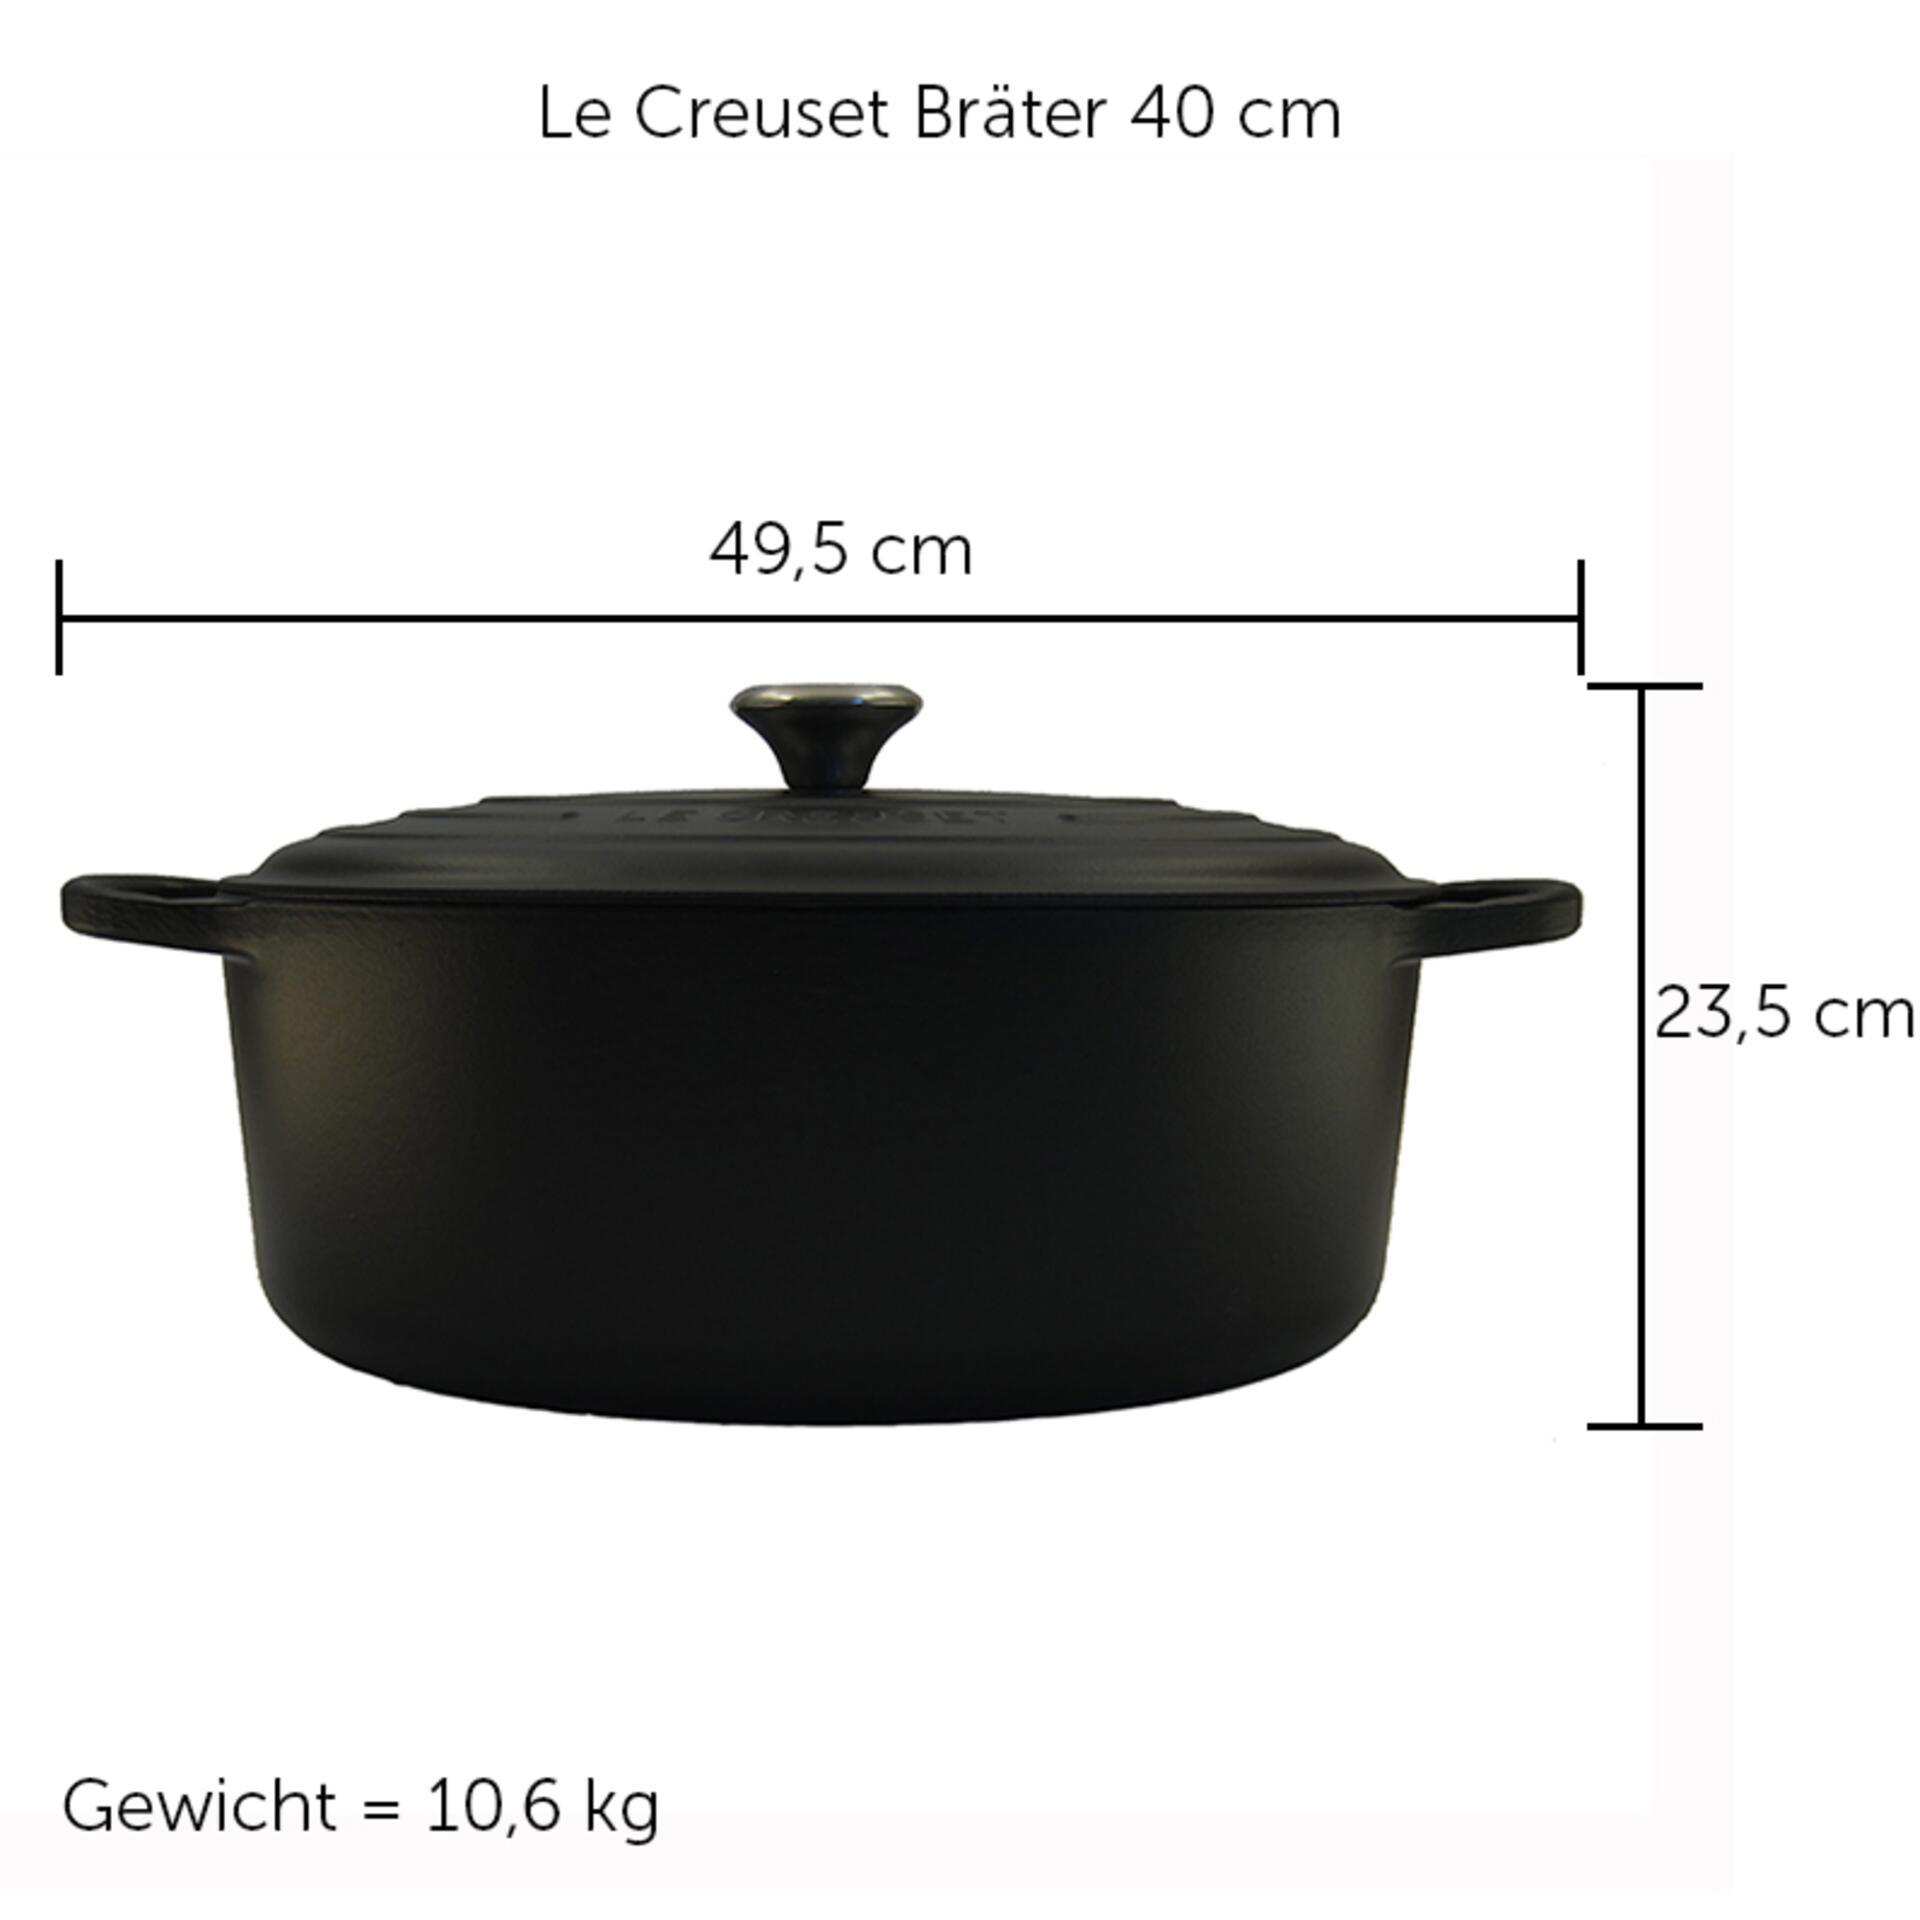 Le Creuset Bräter Signature 40 cm oval Kirschrot 13,9 L